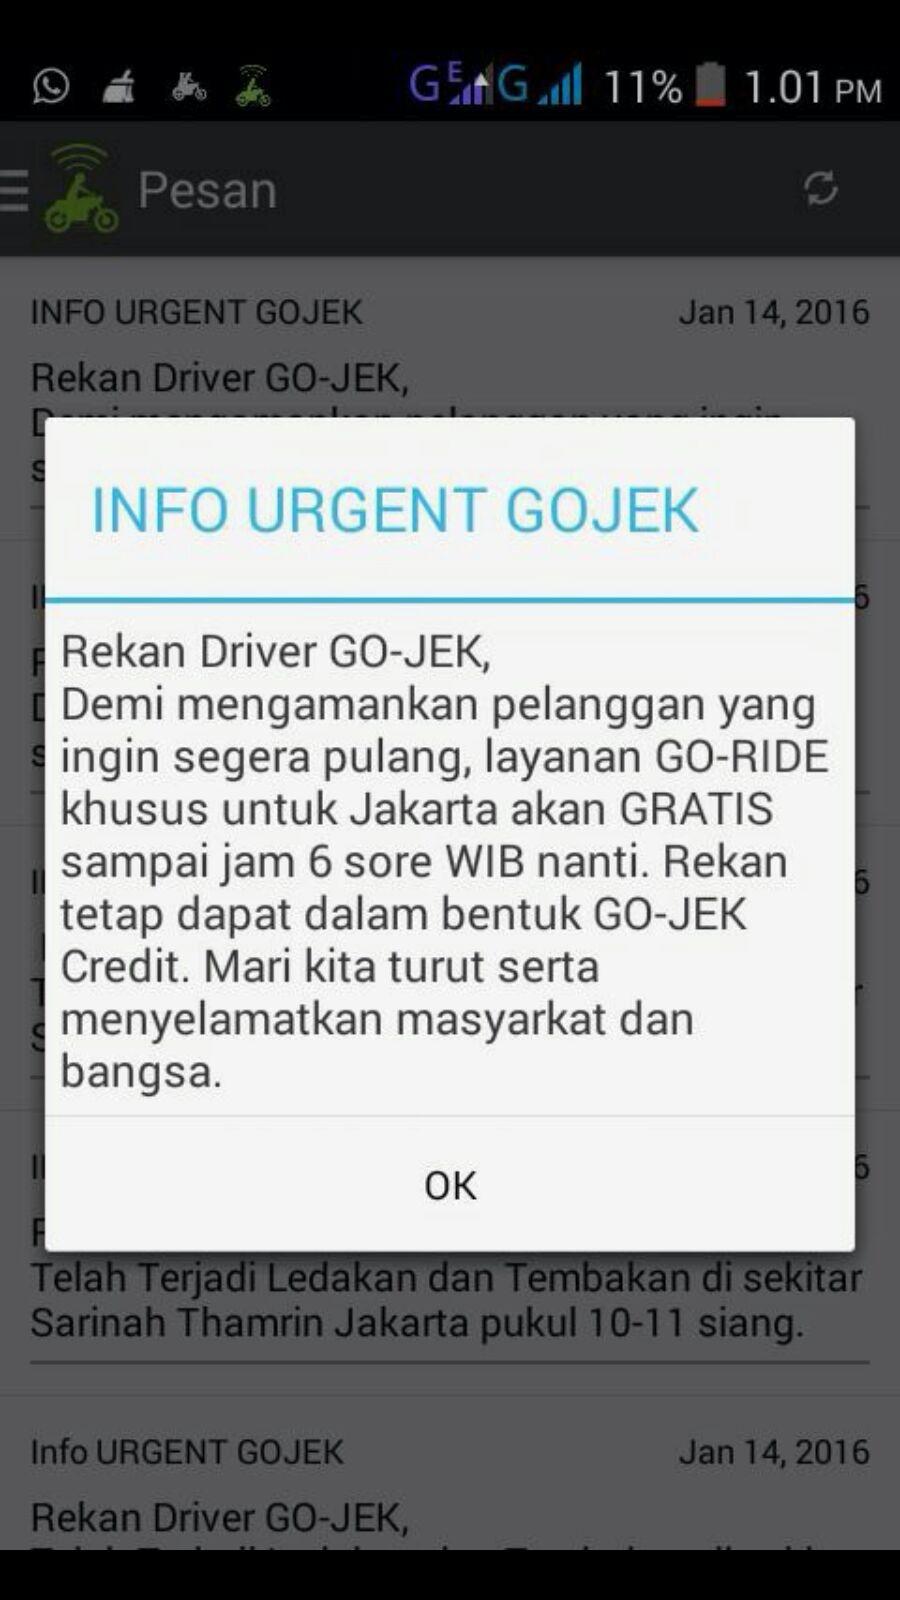 free ride gojek jakarta attacks